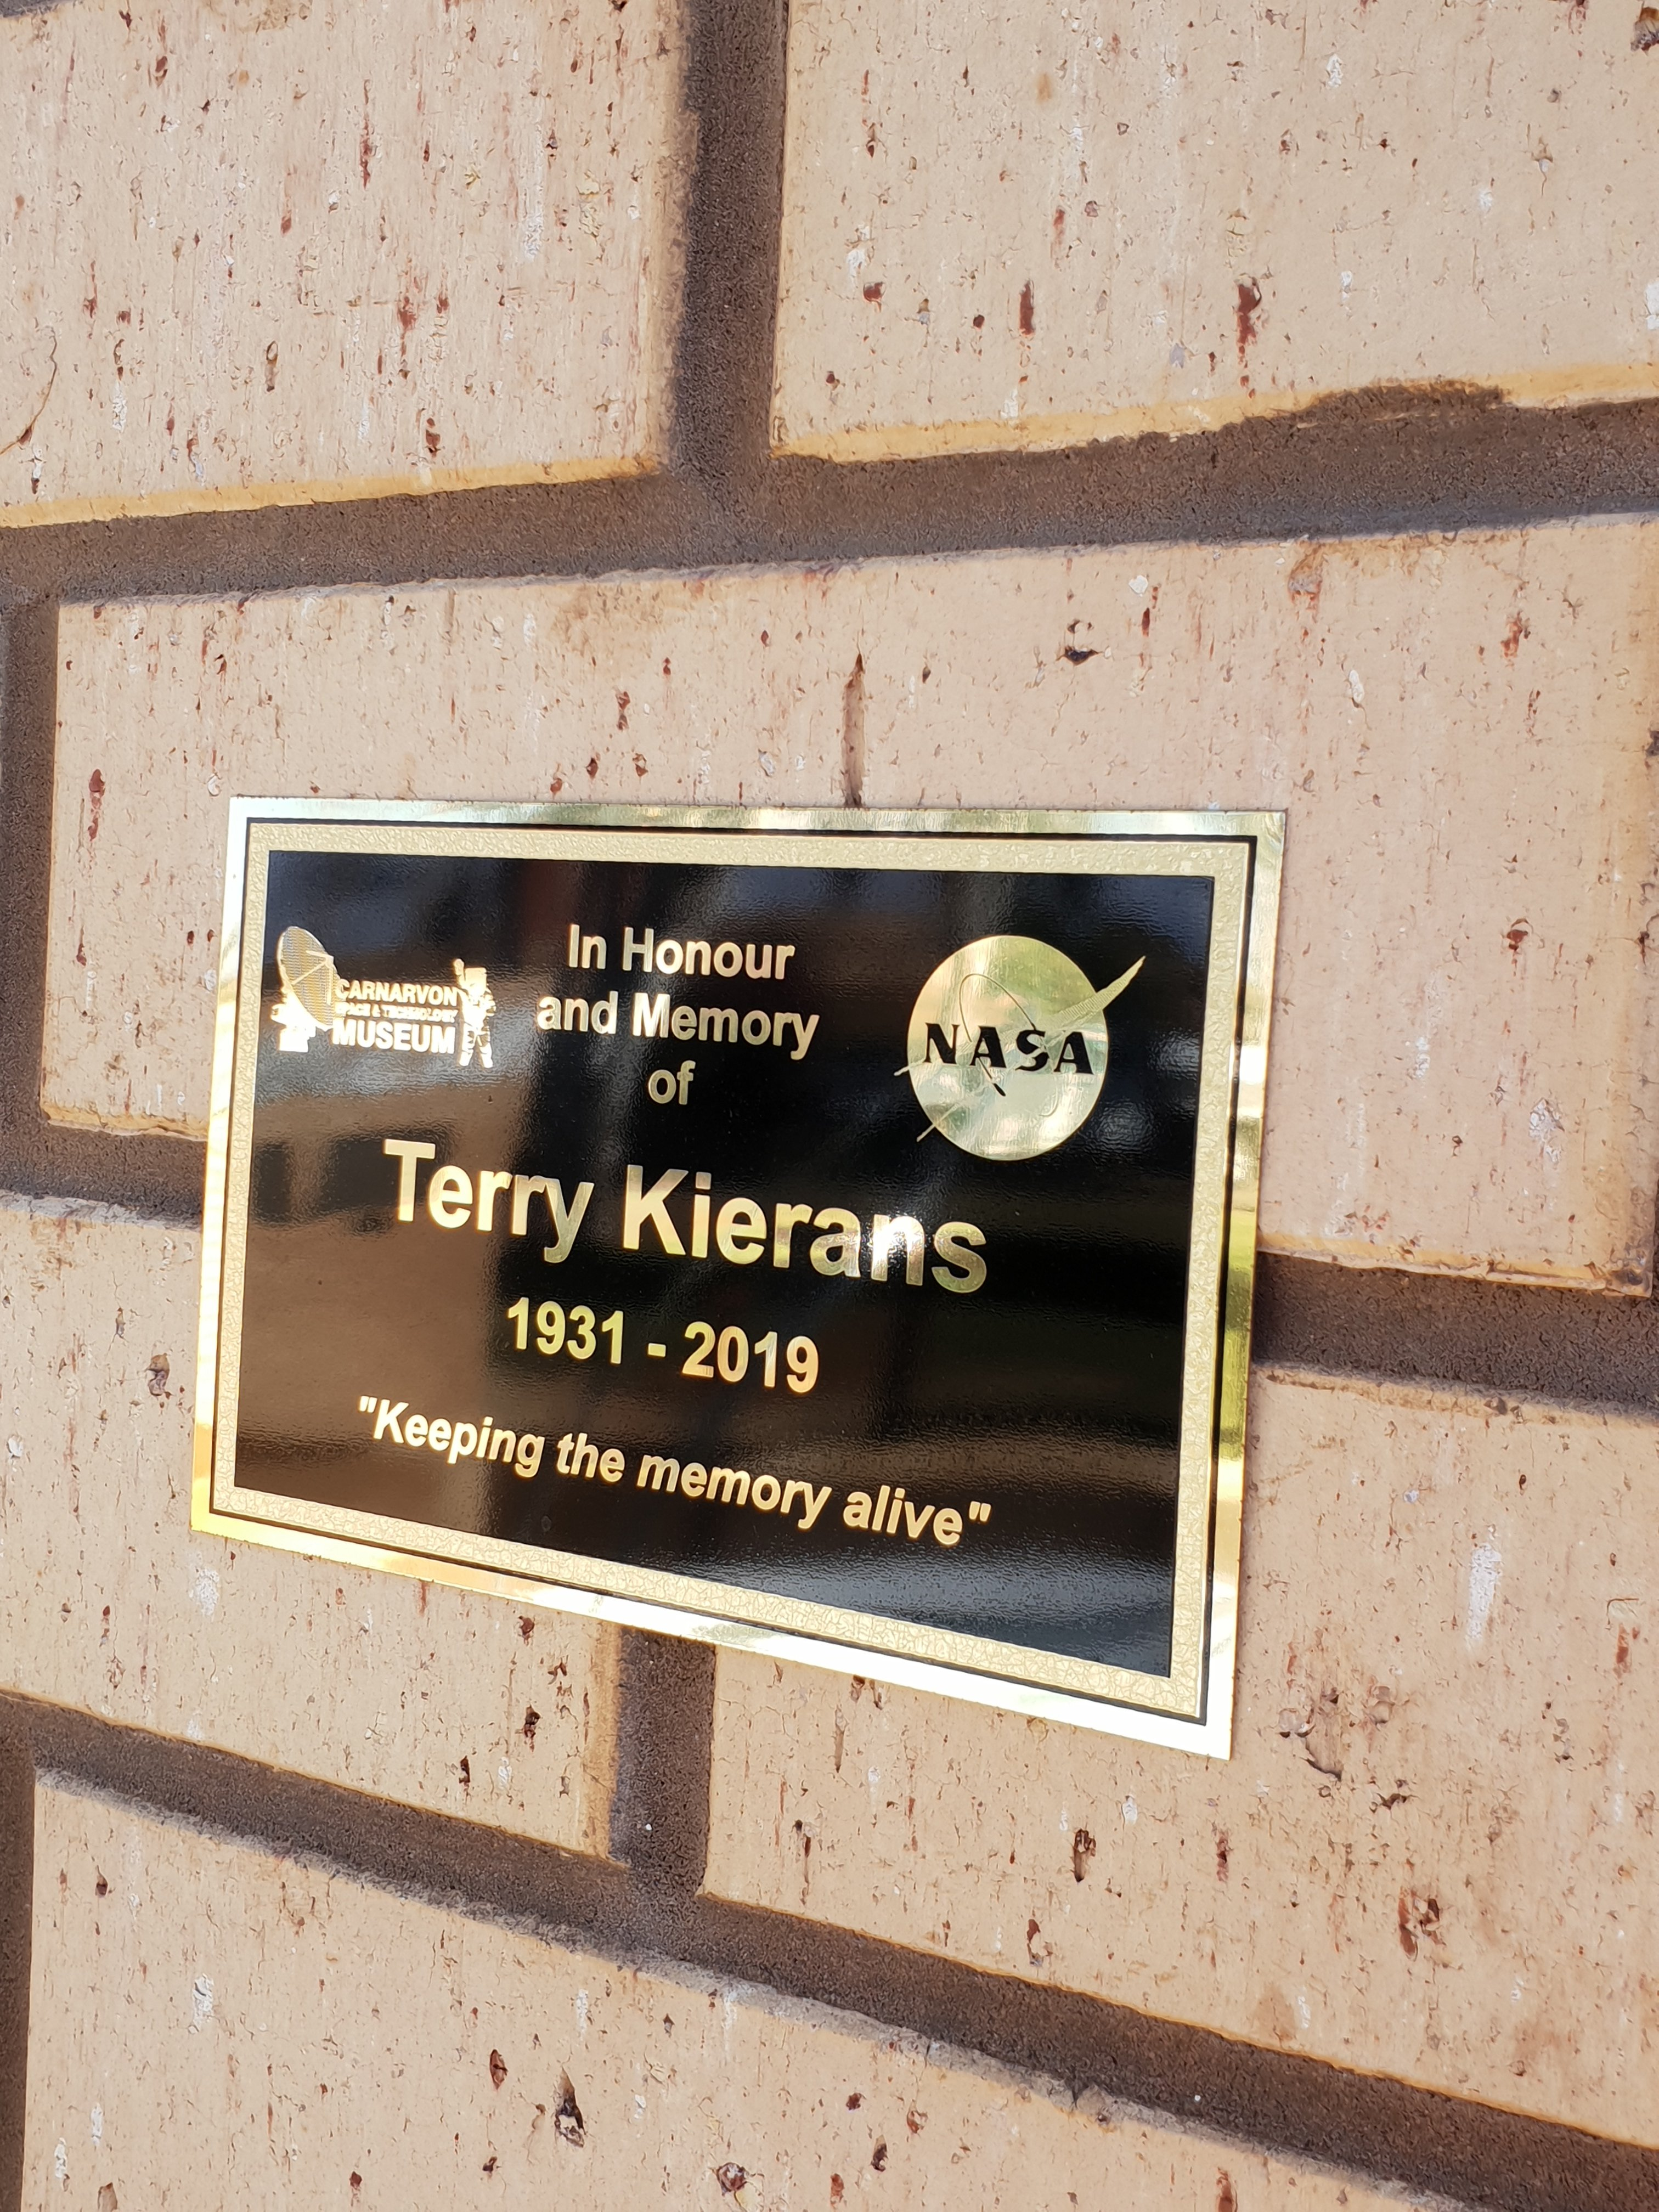 Terry Kierans